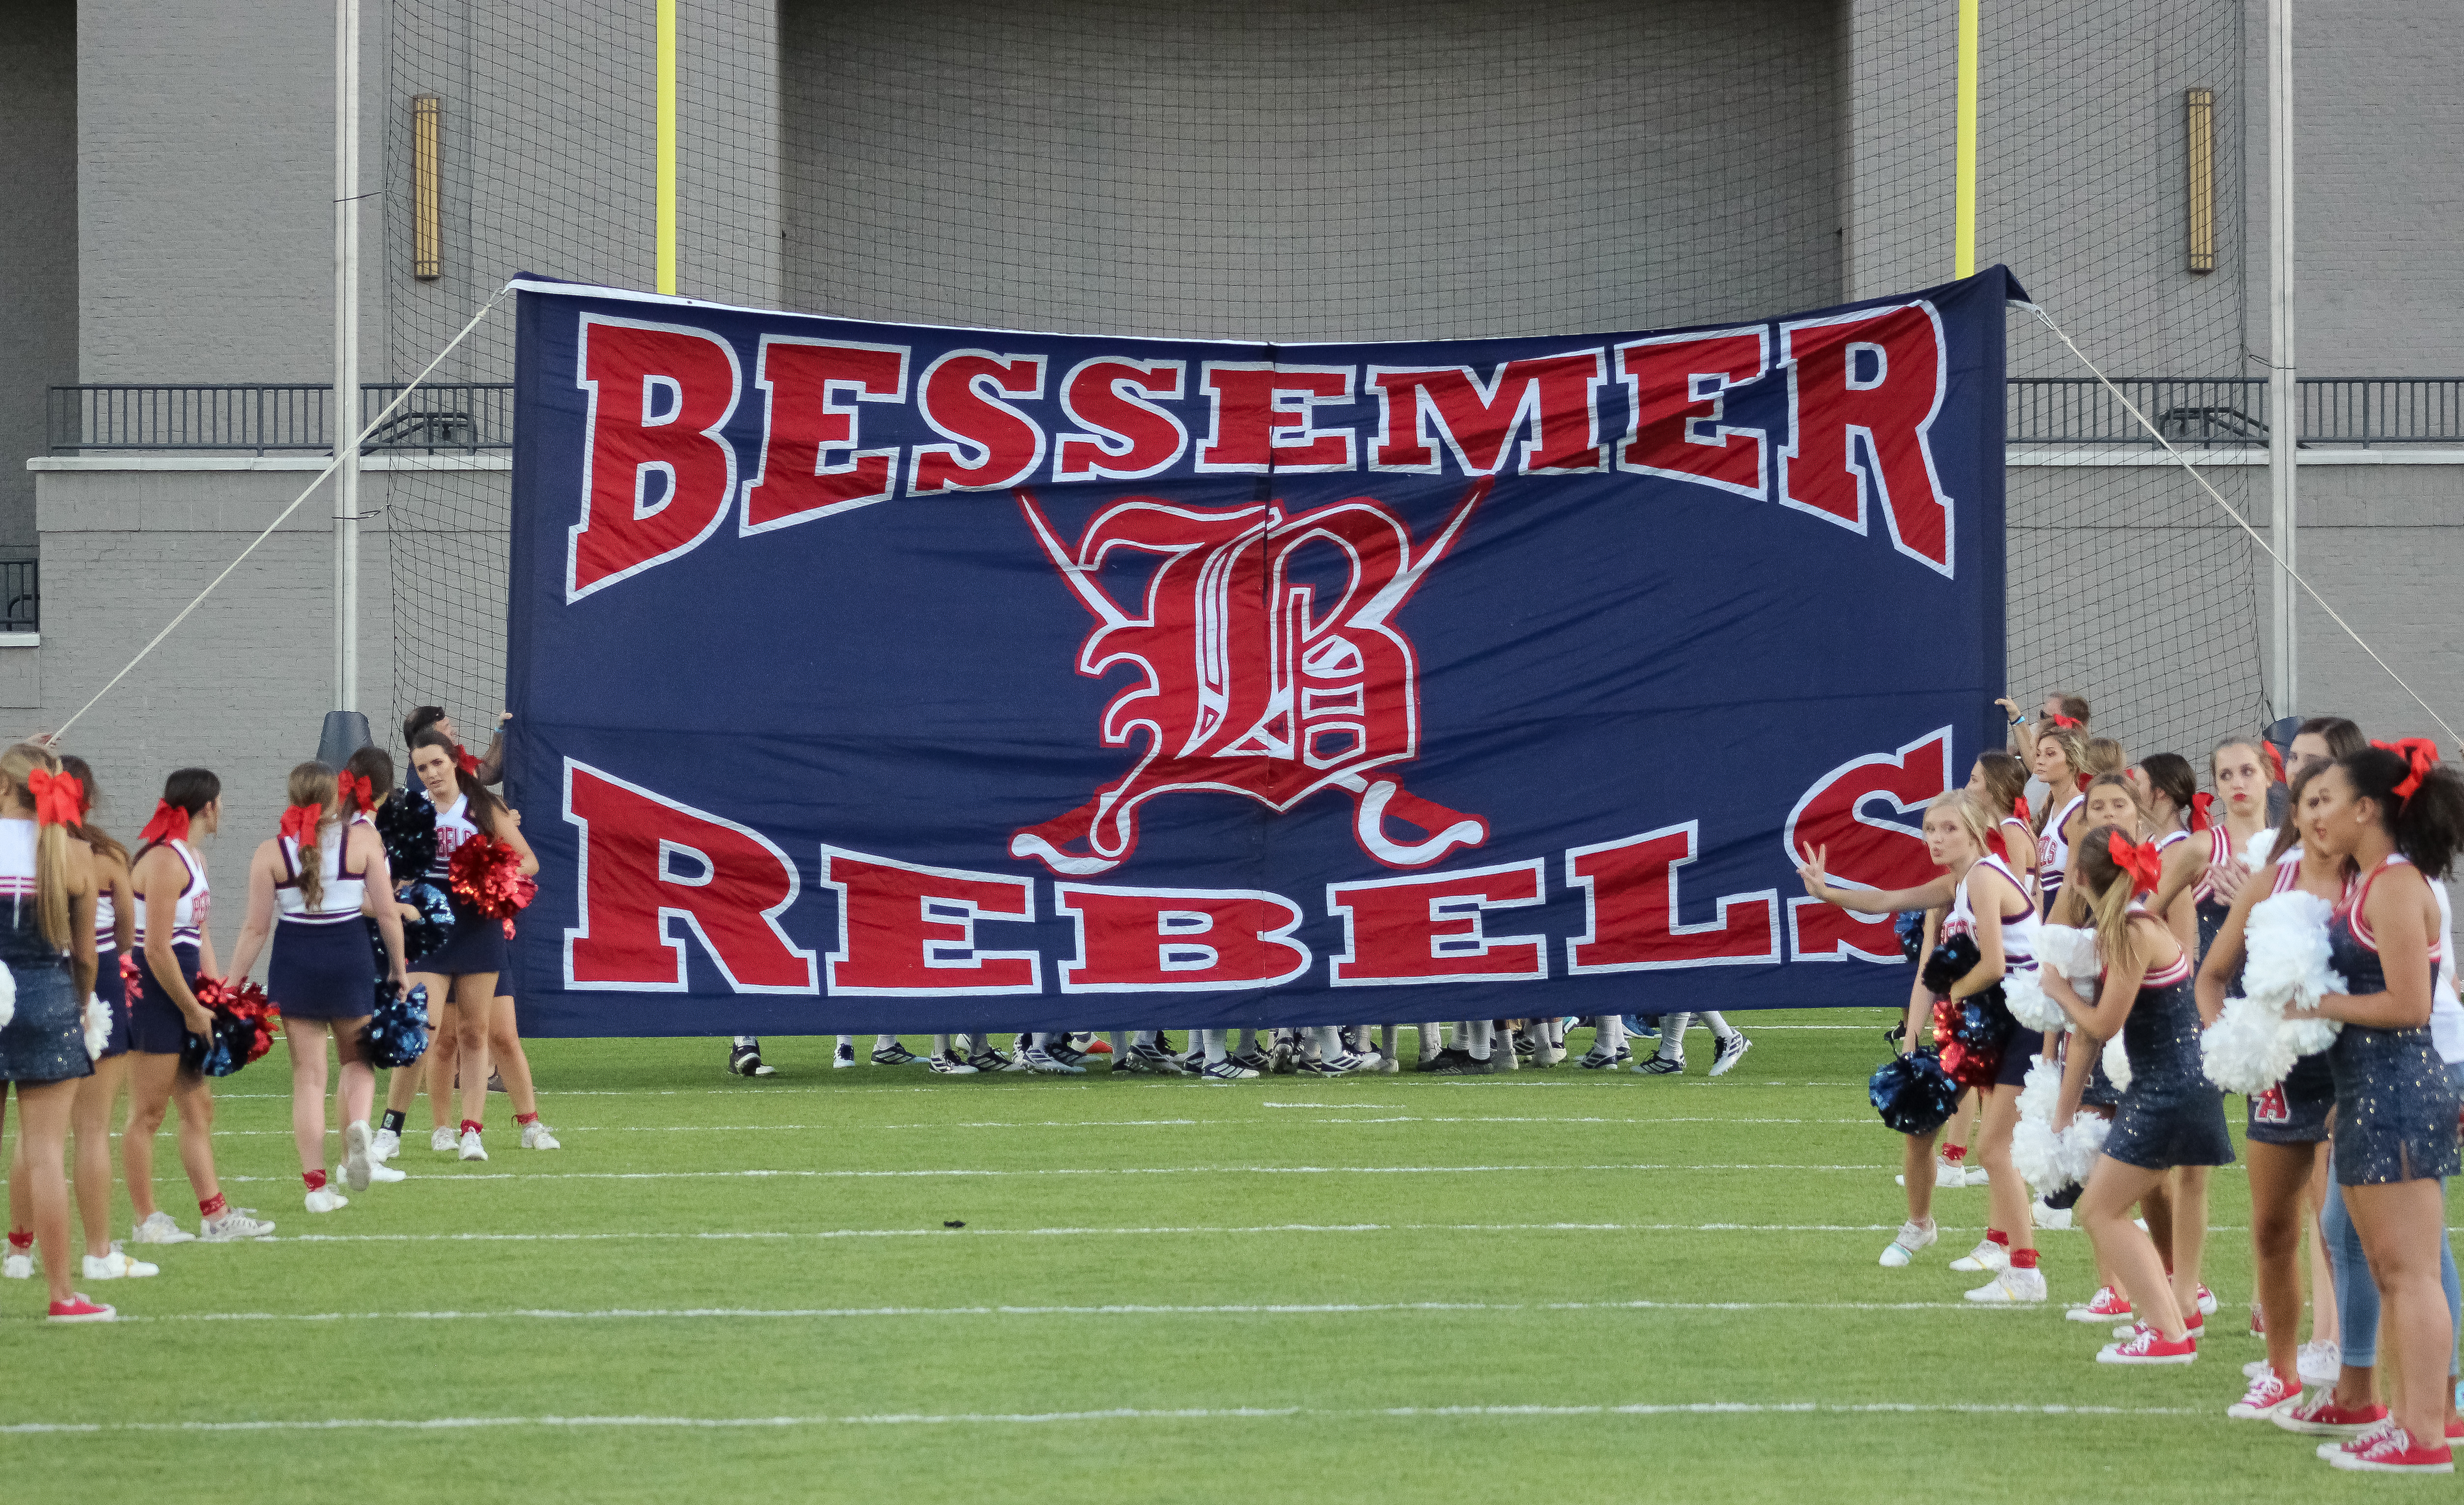 Madison-Ridgeland Academy vs Bessemer Academy